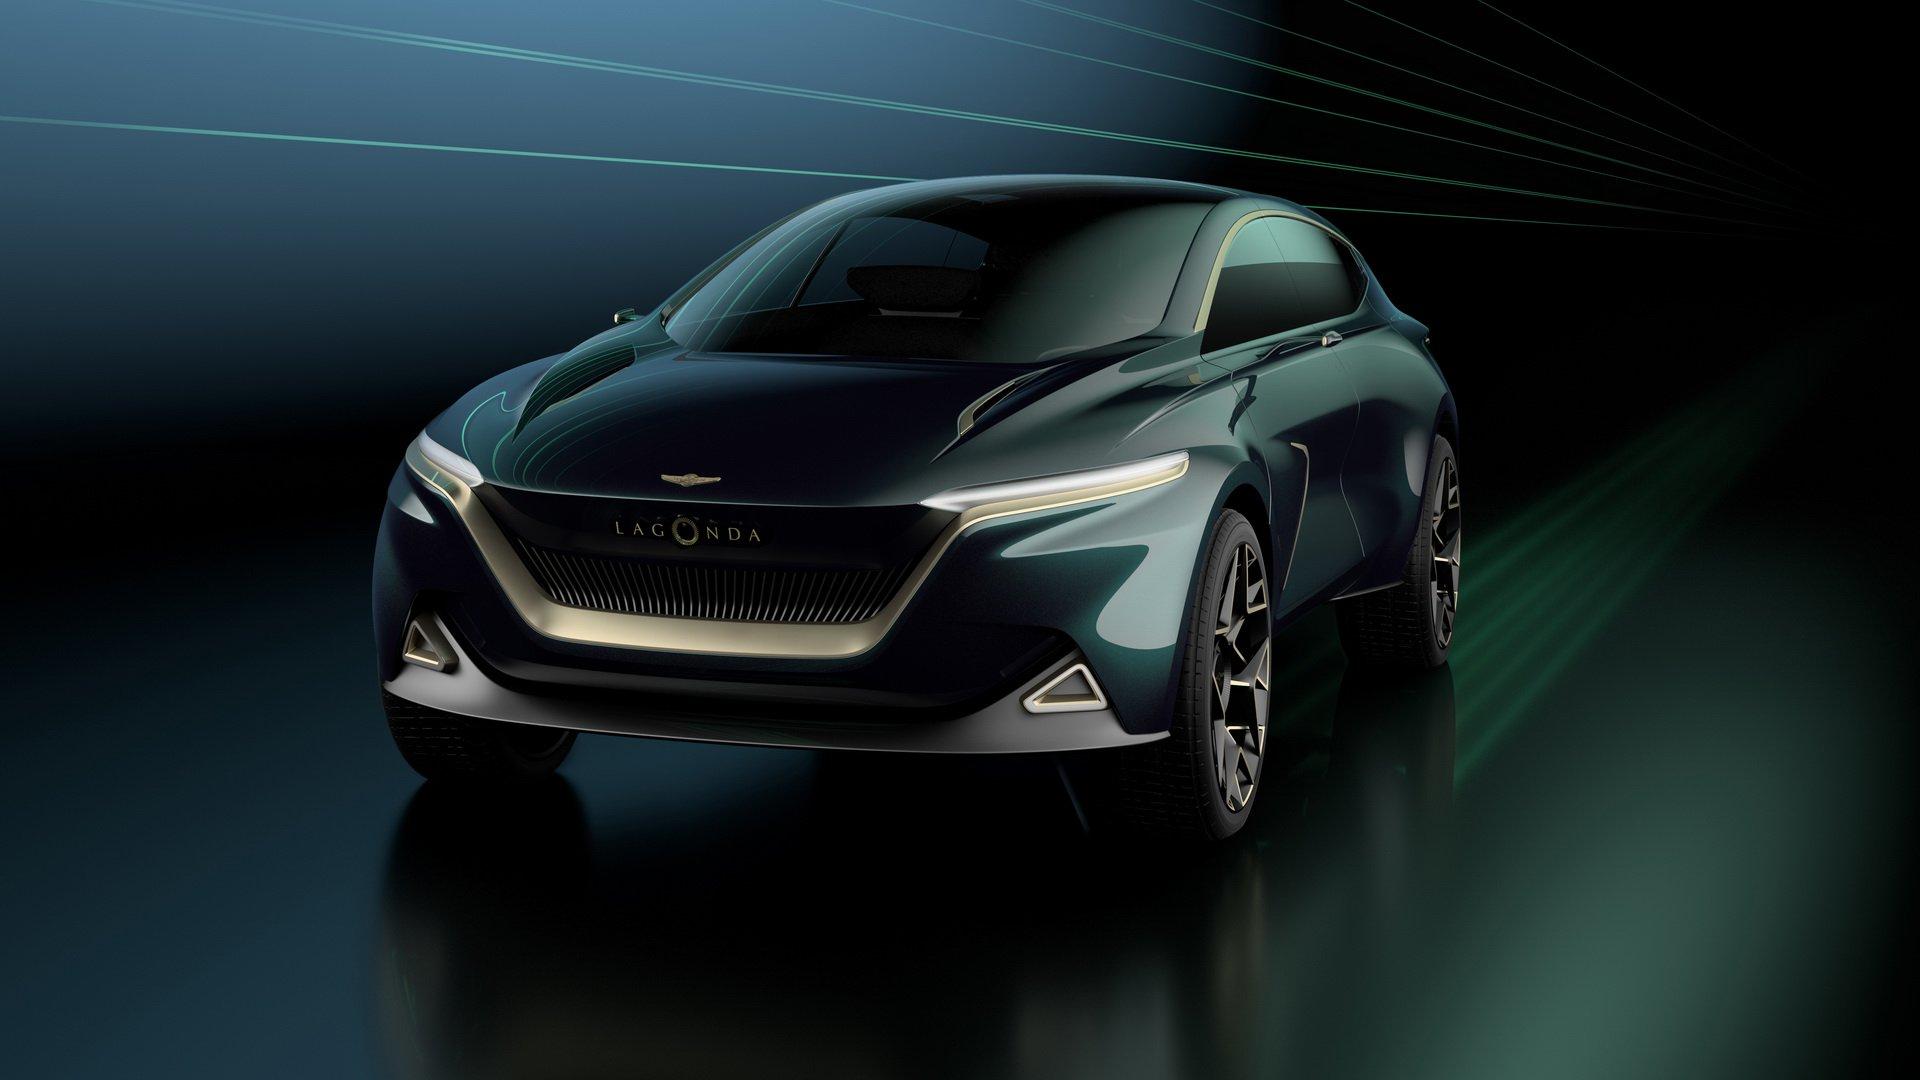 Lagonda All-Terrain Concept (2)